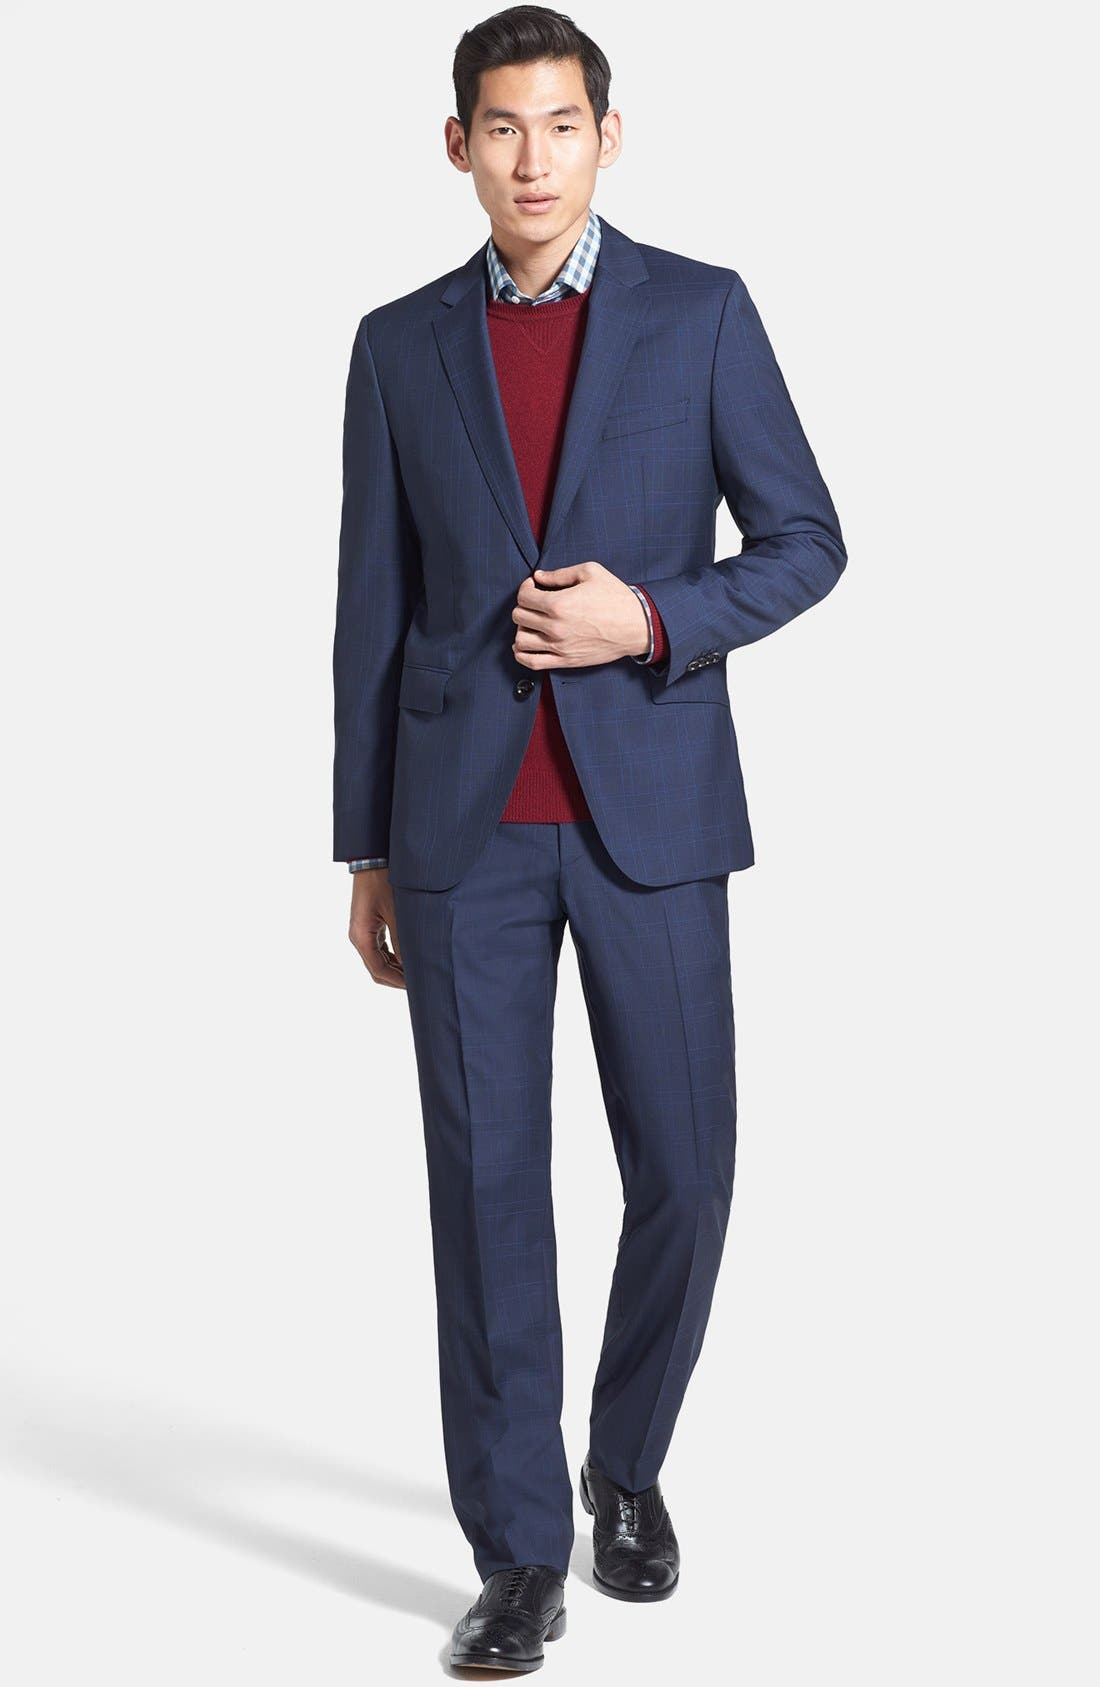 Alternate Image 1 Selected - BOSS HUGO BOSS 'James/Sharp' Trim Fit Windowpane Suit